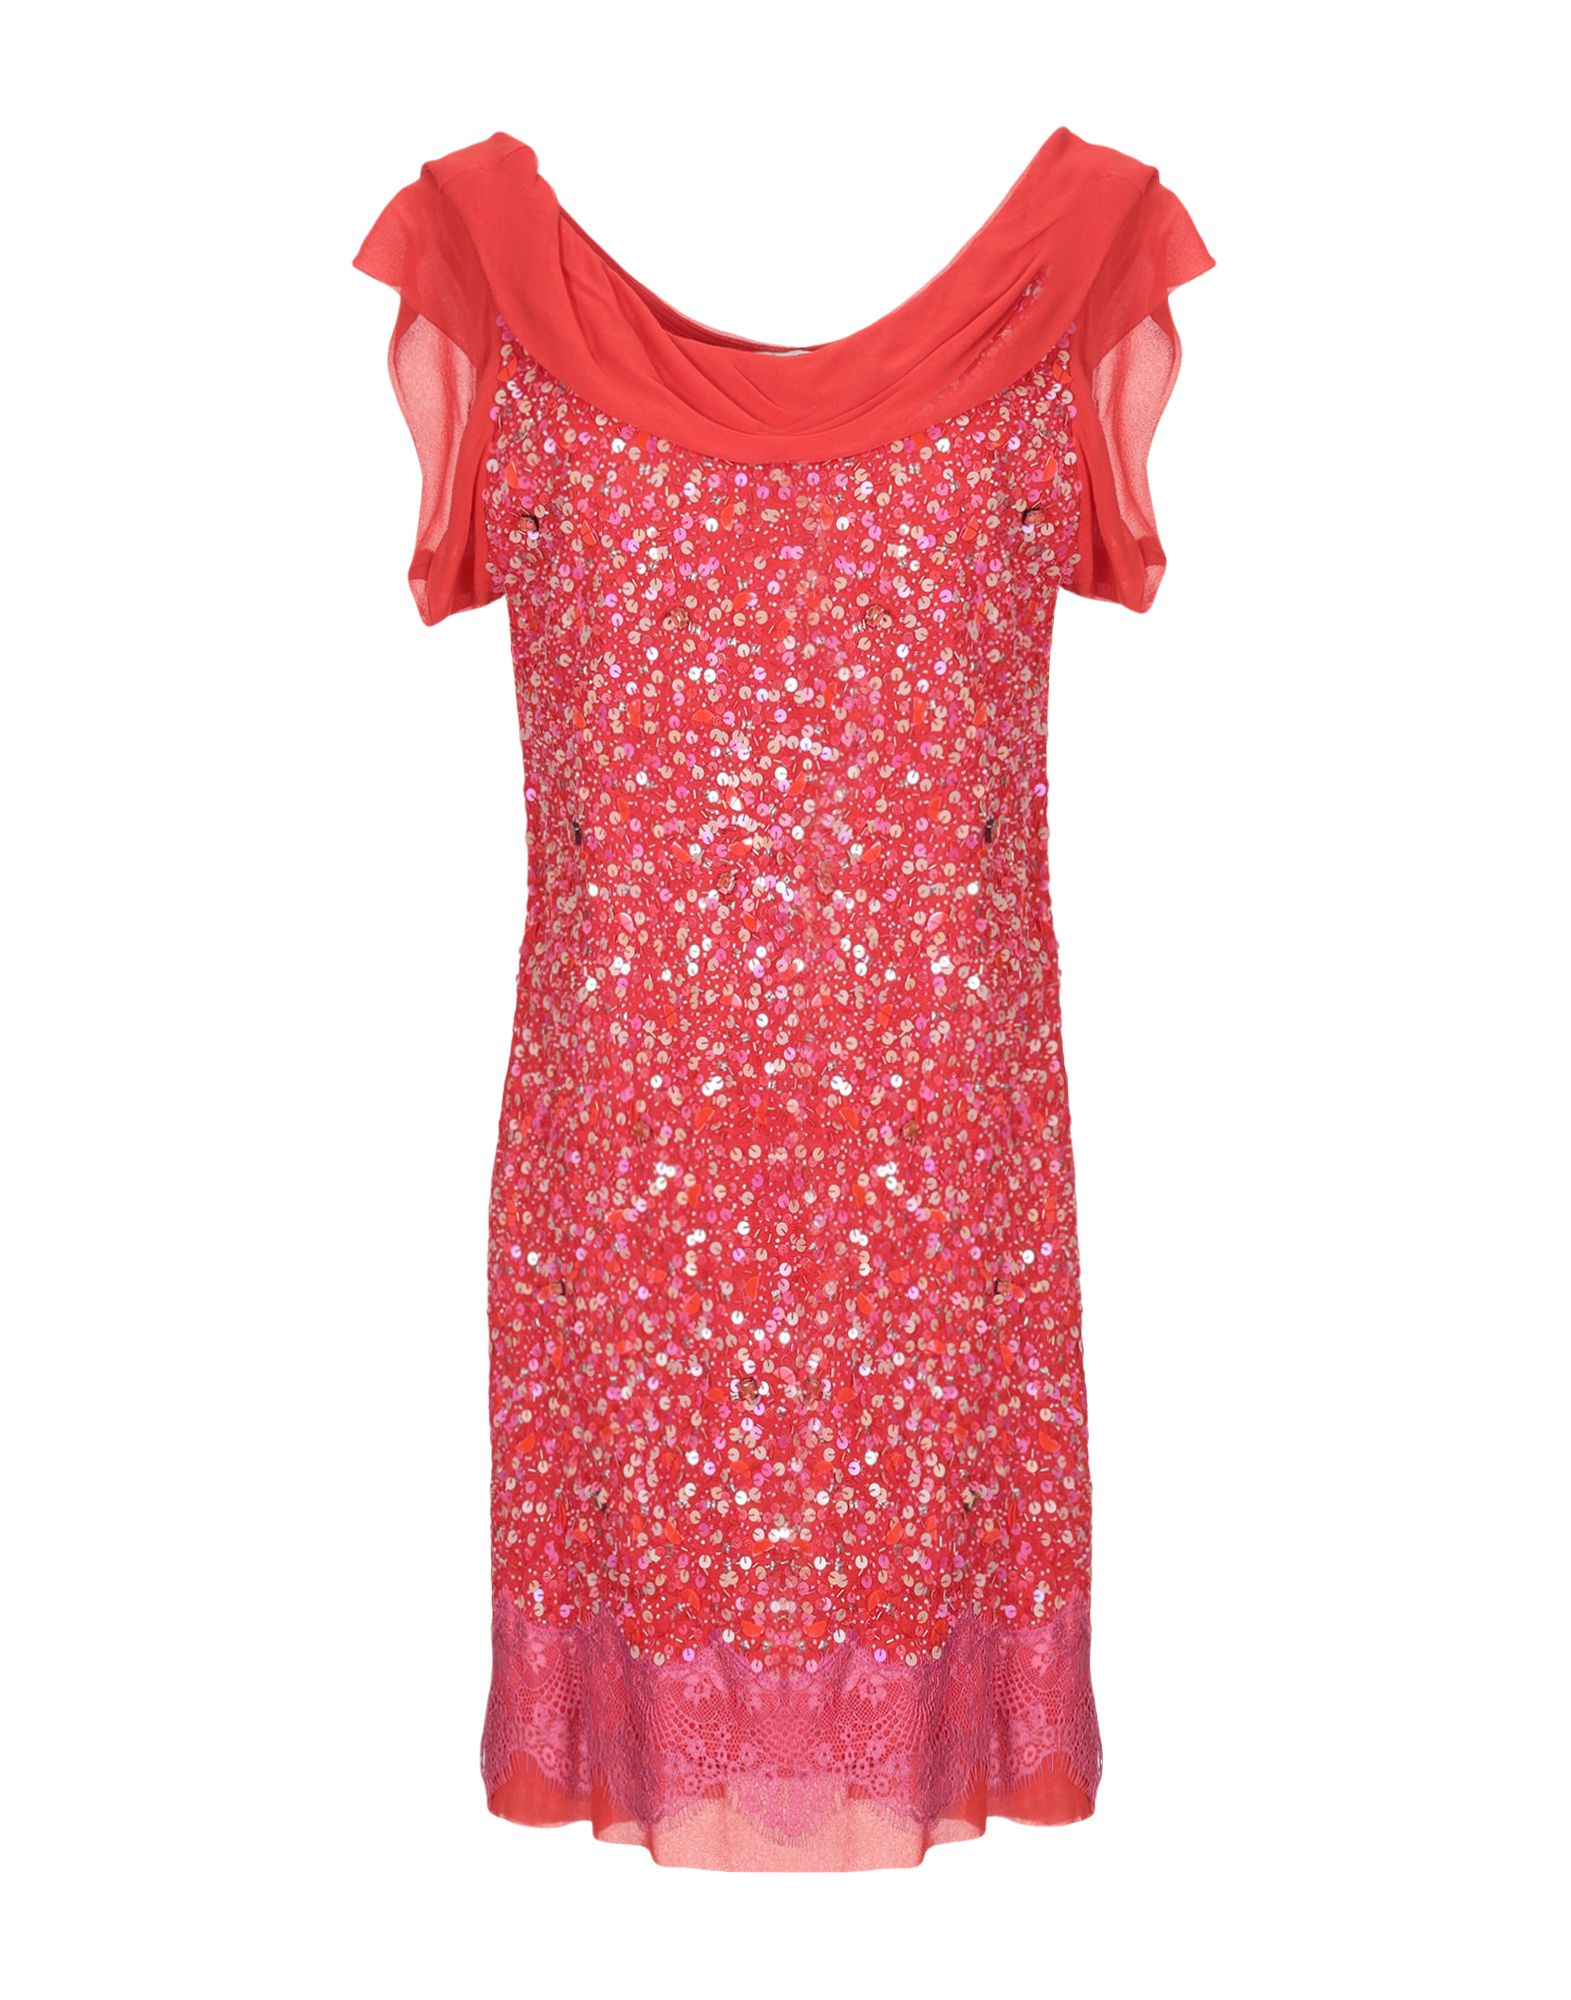 LE RAGAZZE DI ST. BARTH Короткое платье недорго, оригинальная цена